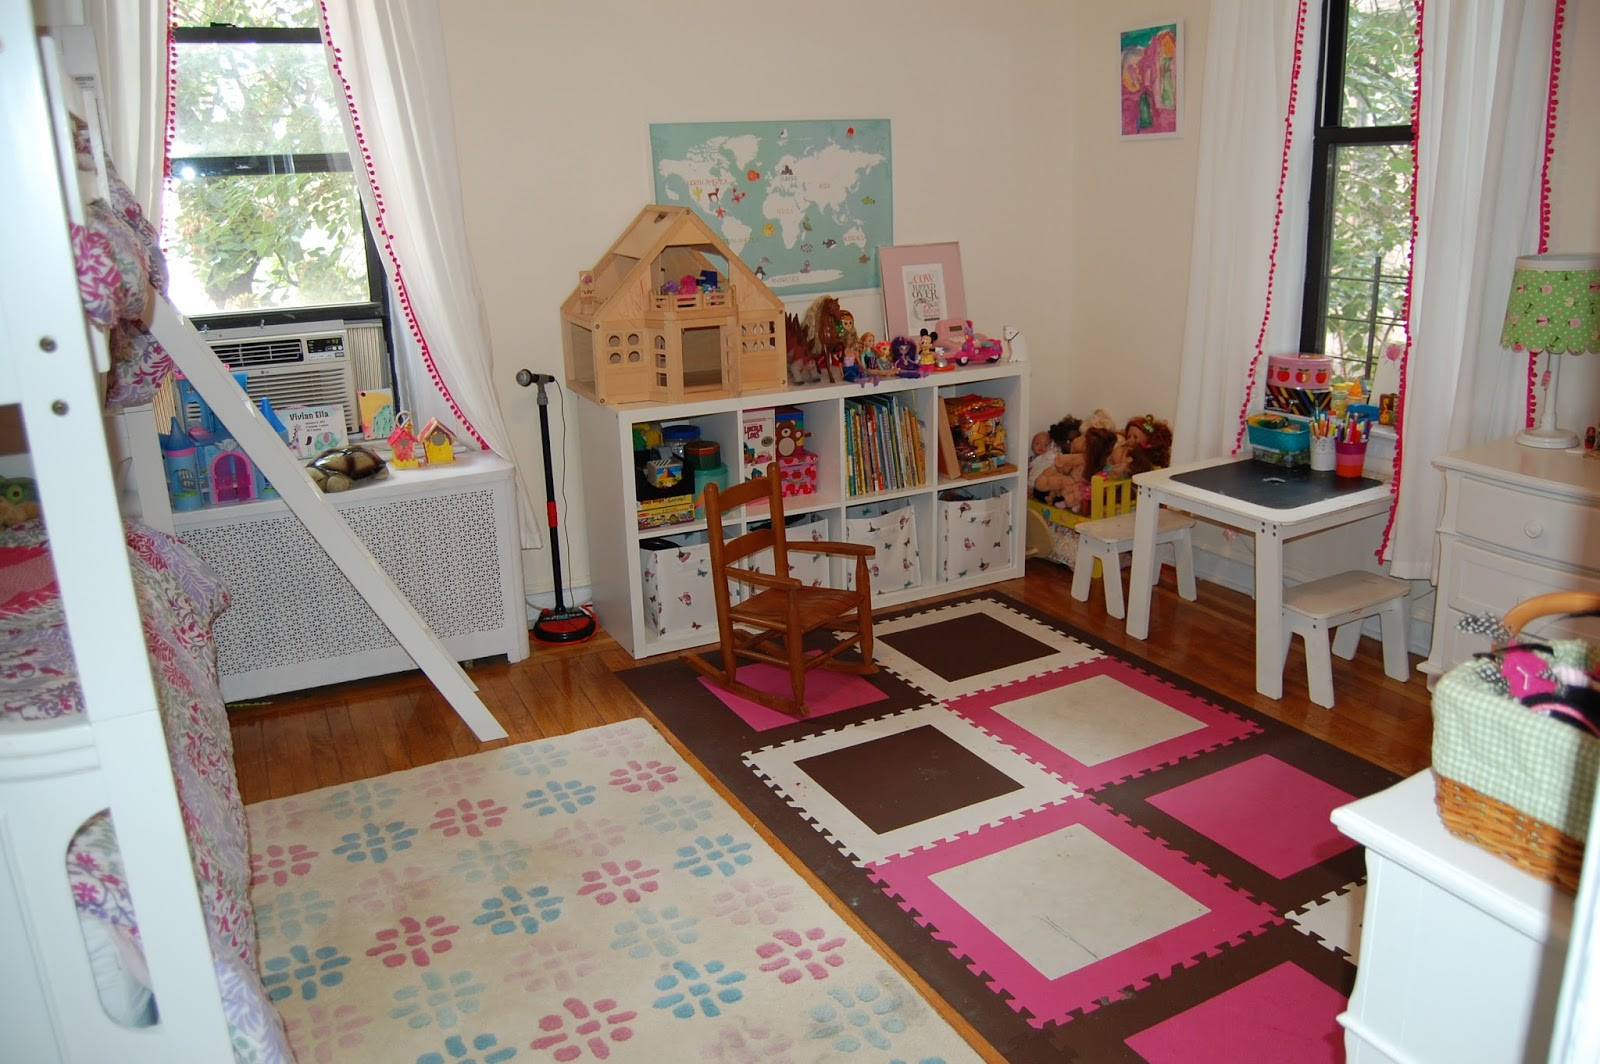 Carpet Tiles For Kids Room  baby meets city A Kids Room Update with FLOR Carpet Tiles